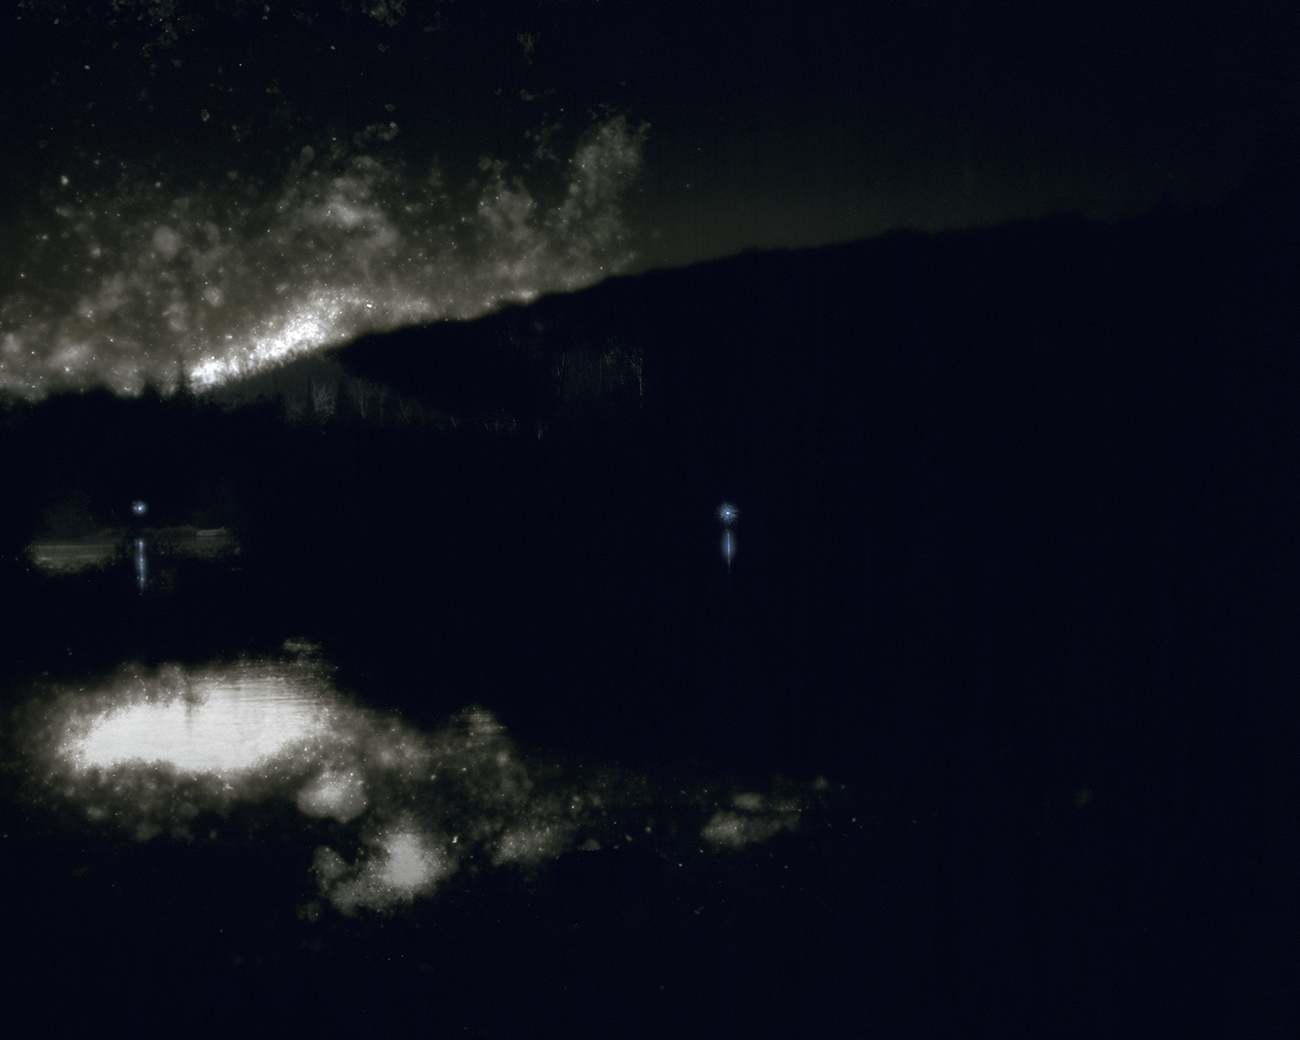 Nocturne no.1  48 x 60 Inches  Digital C-Print